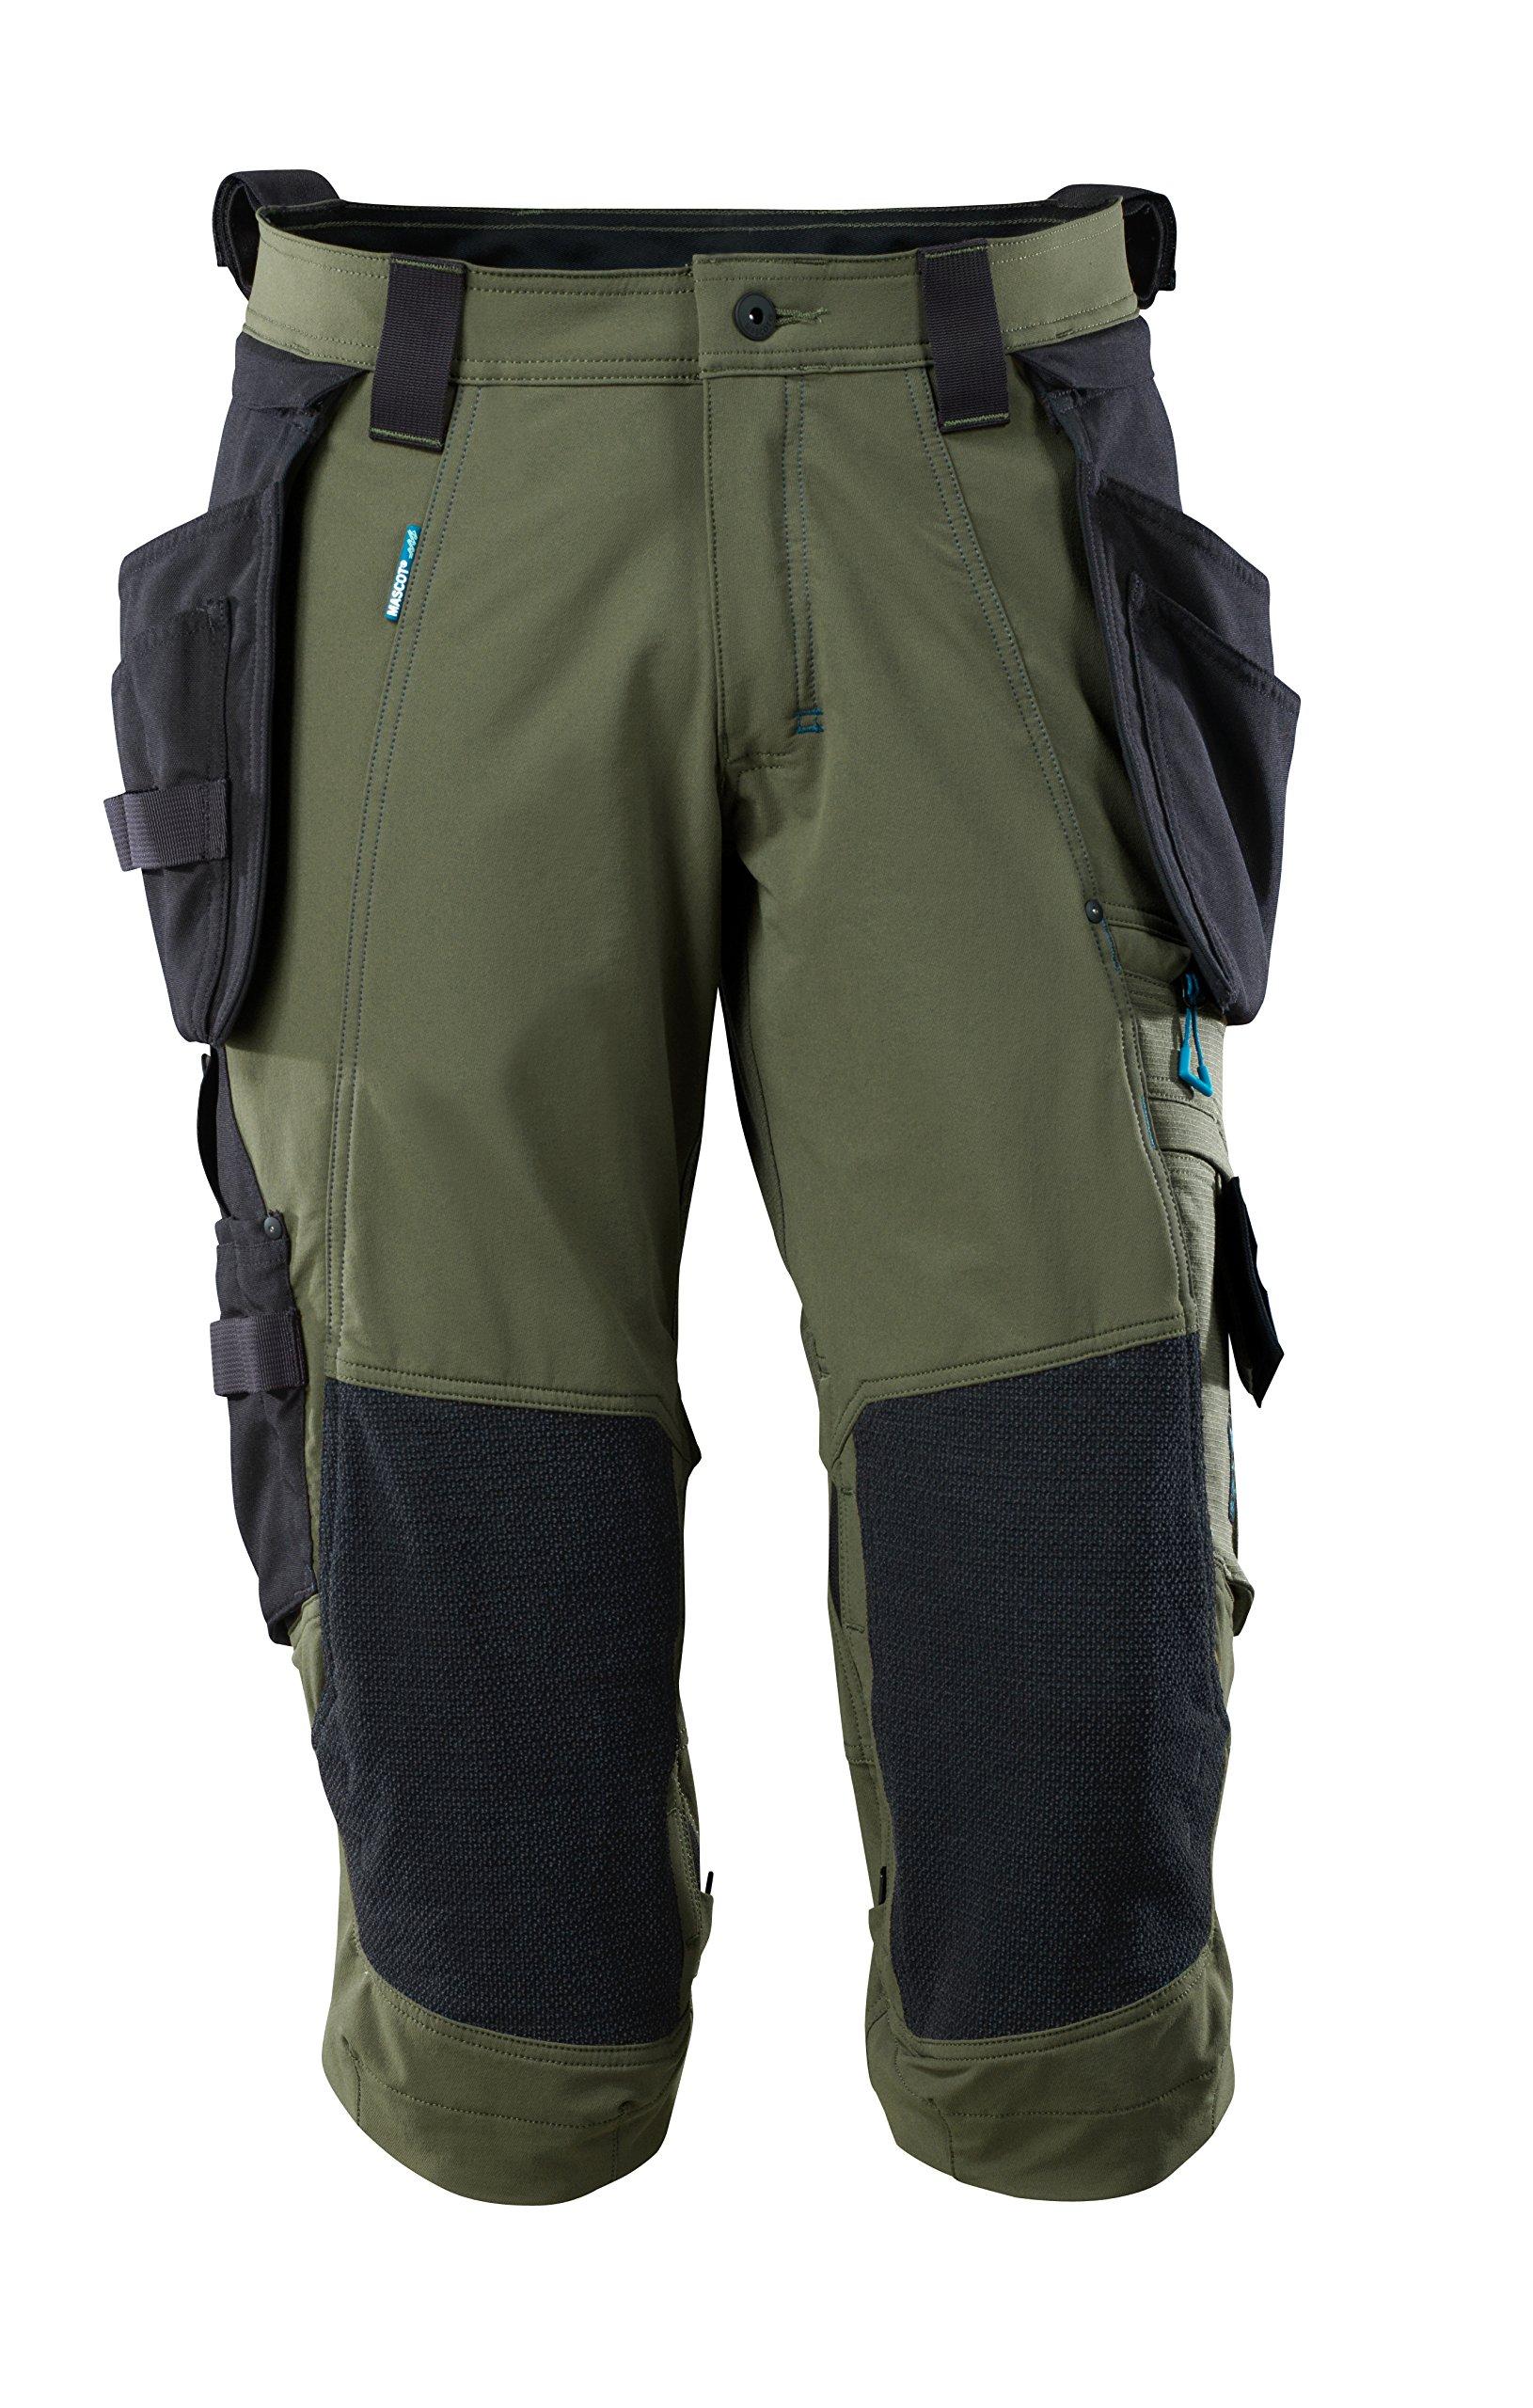 Mascot 17049-311-33-C48 Stretch Shorts Size C48, Moss Green